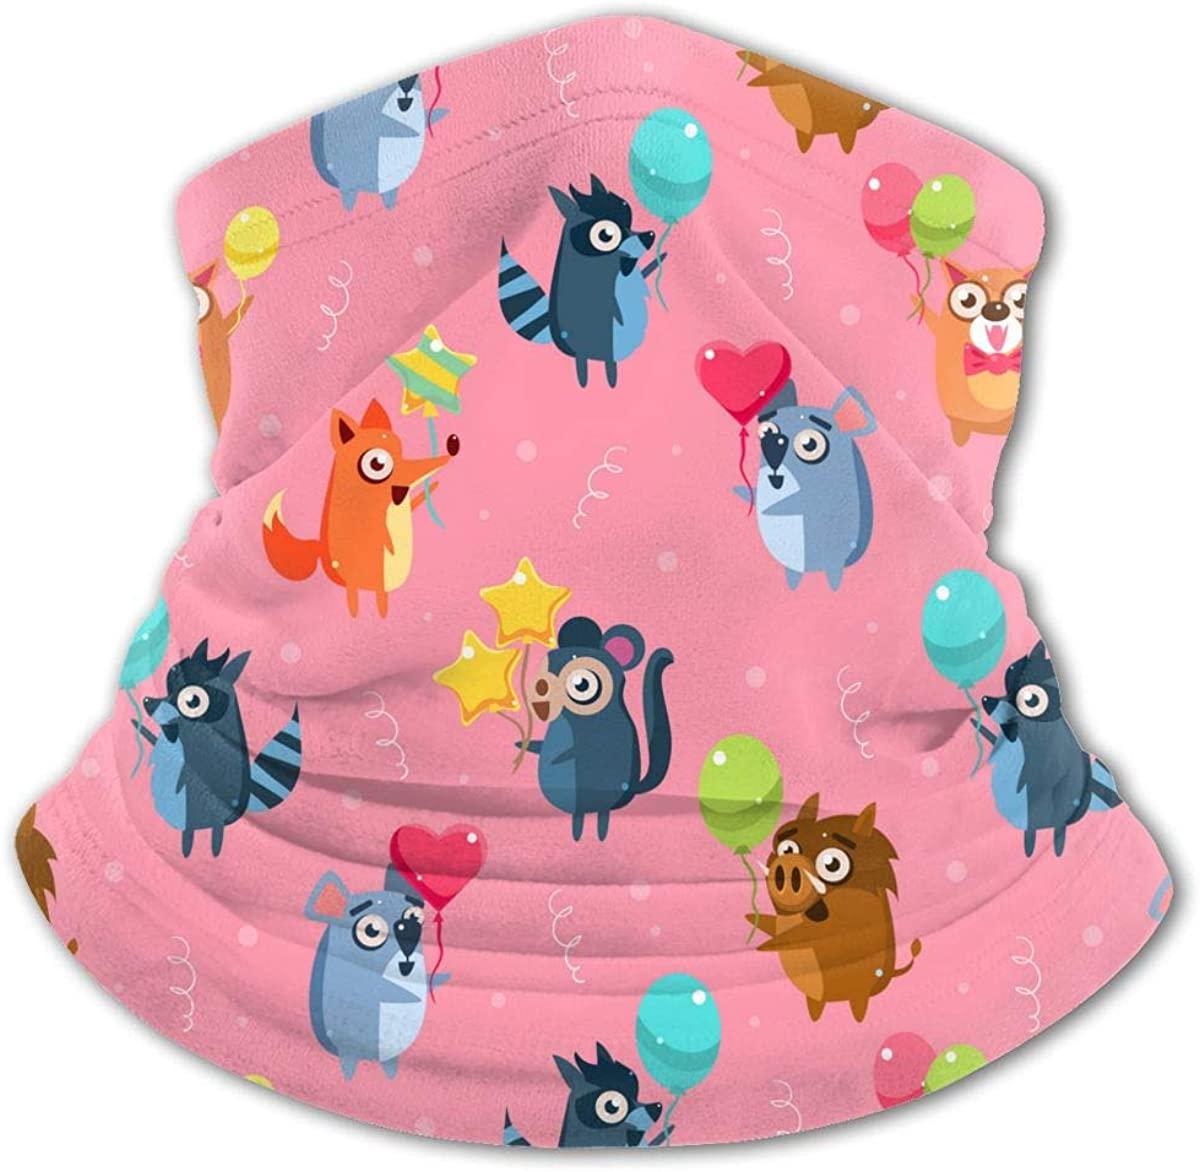 Cute Funny Animals with Colorfu Kids Bandanas Reusable Washable Neck Gaiter Balaclava,Half Face Protective Masks